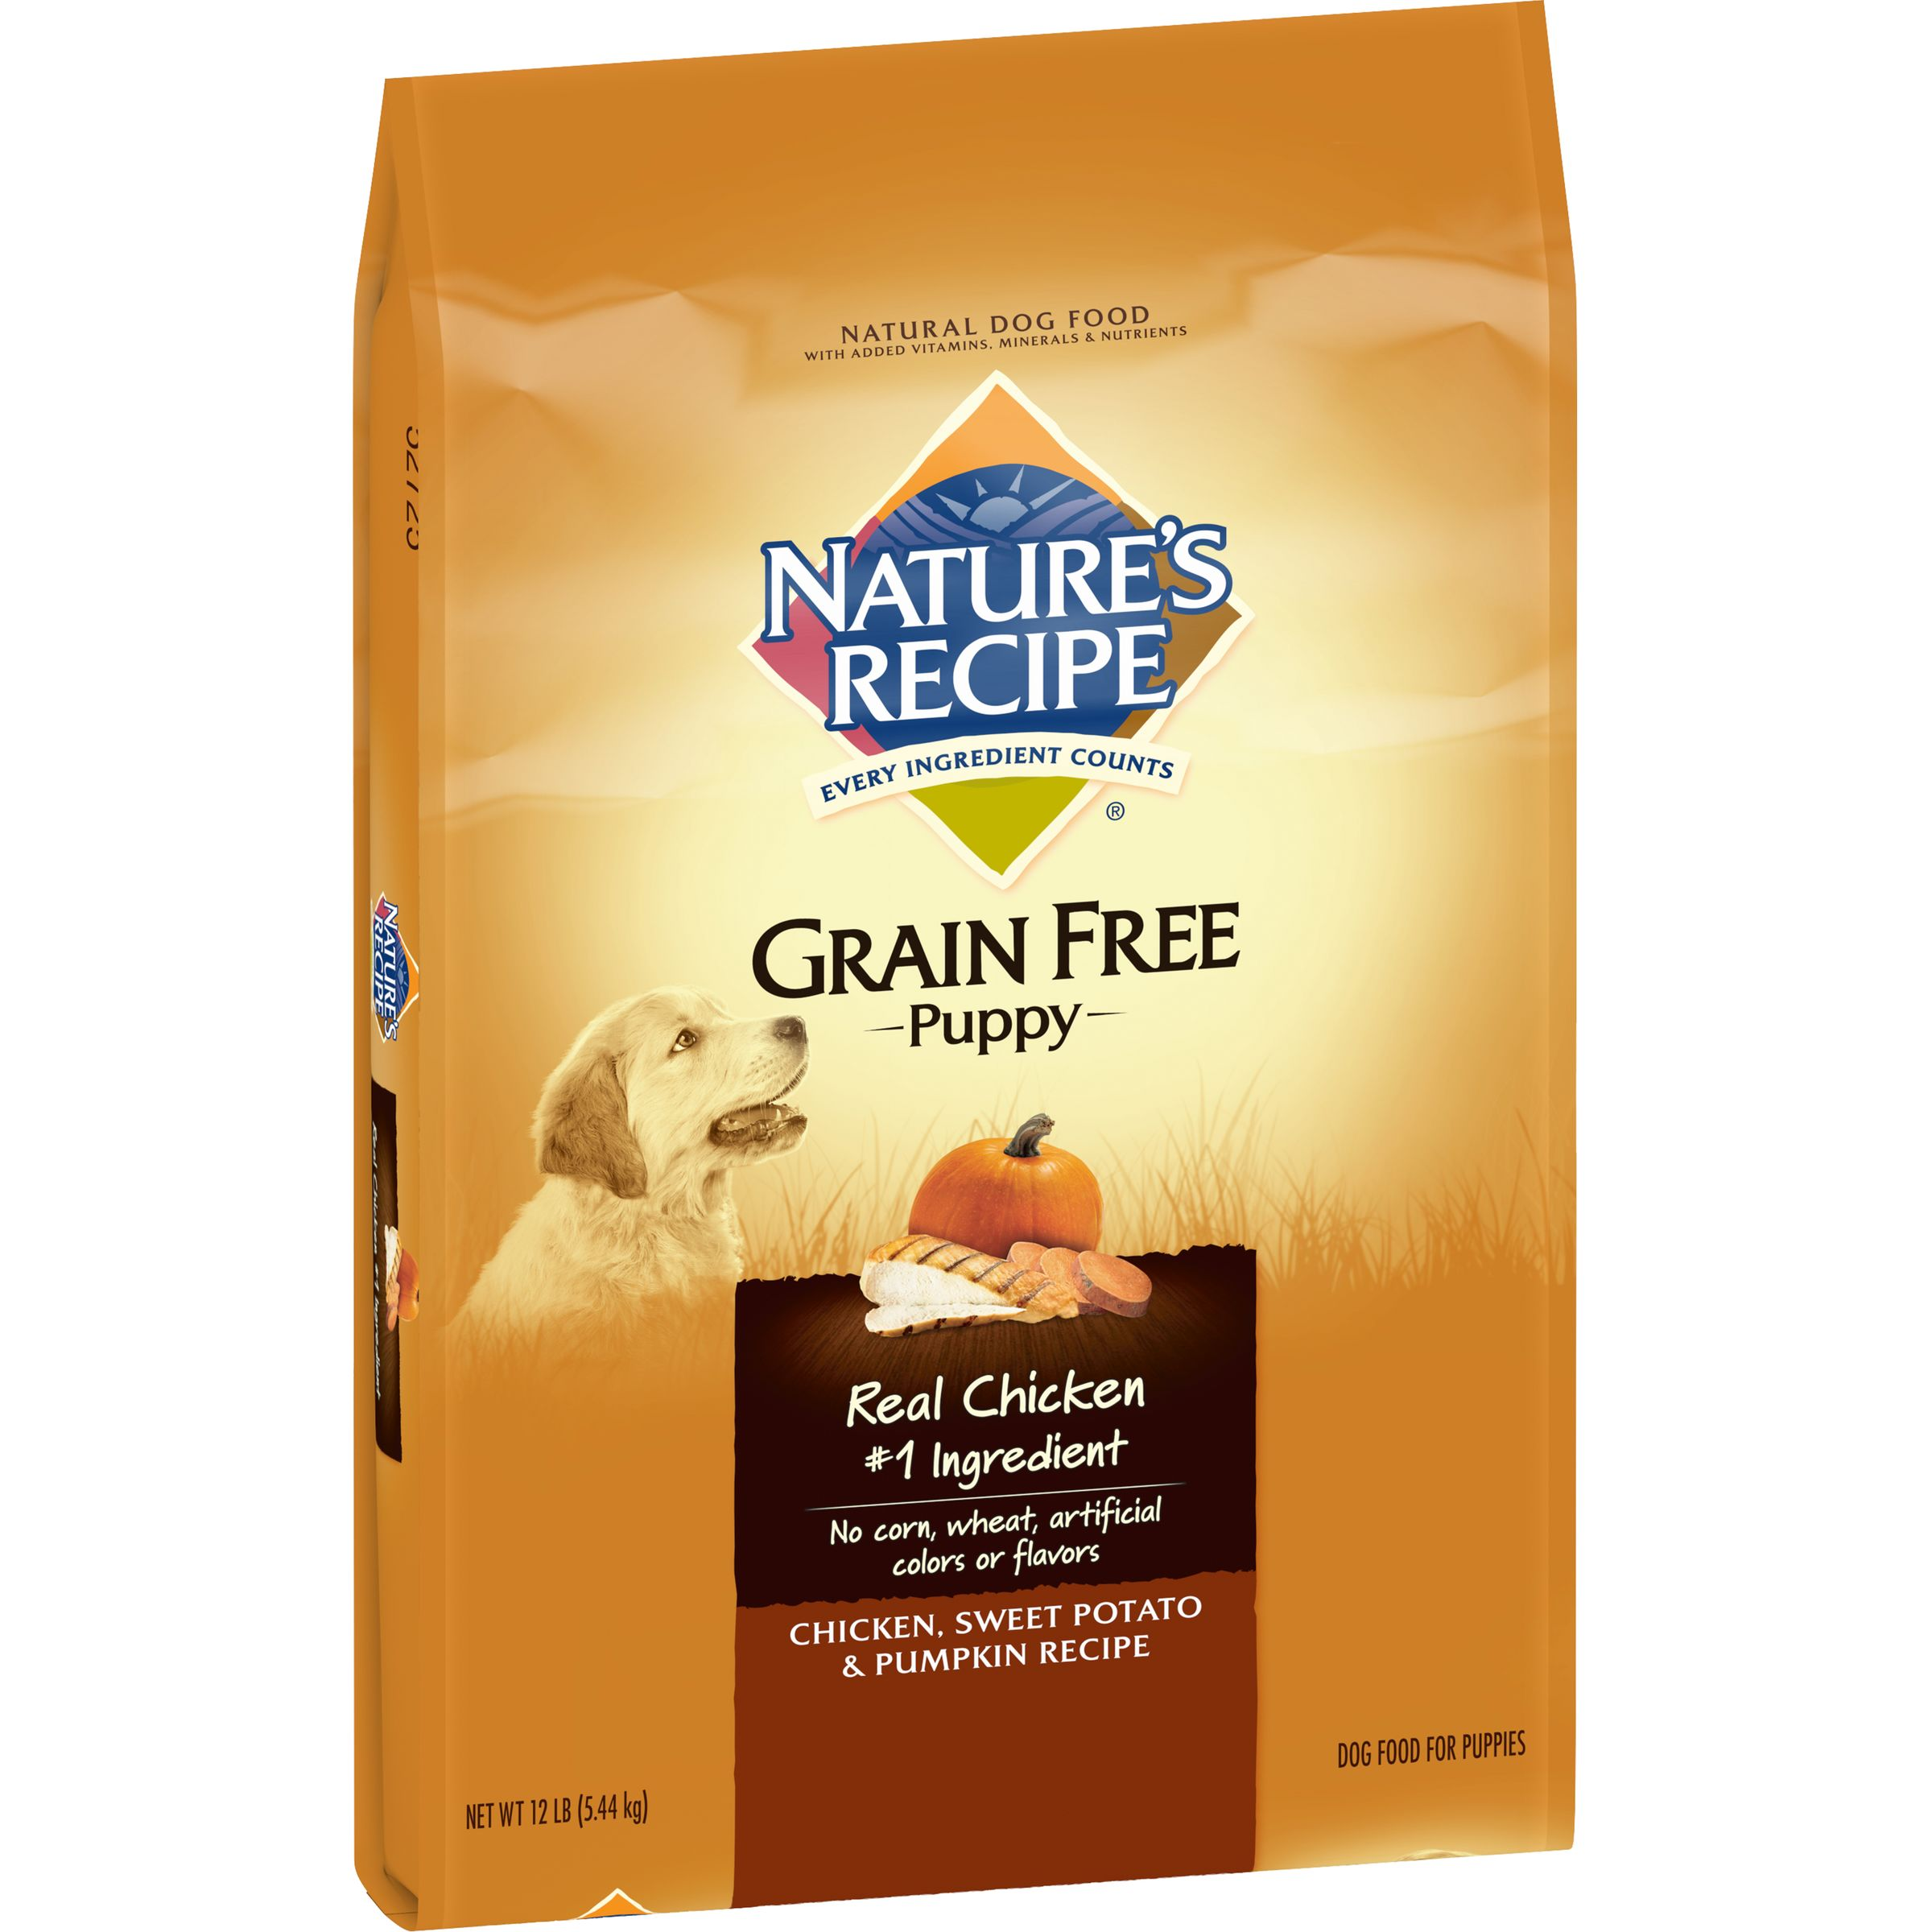 nature's recipe grain free puppy chicken, sweet potato & pumpkin